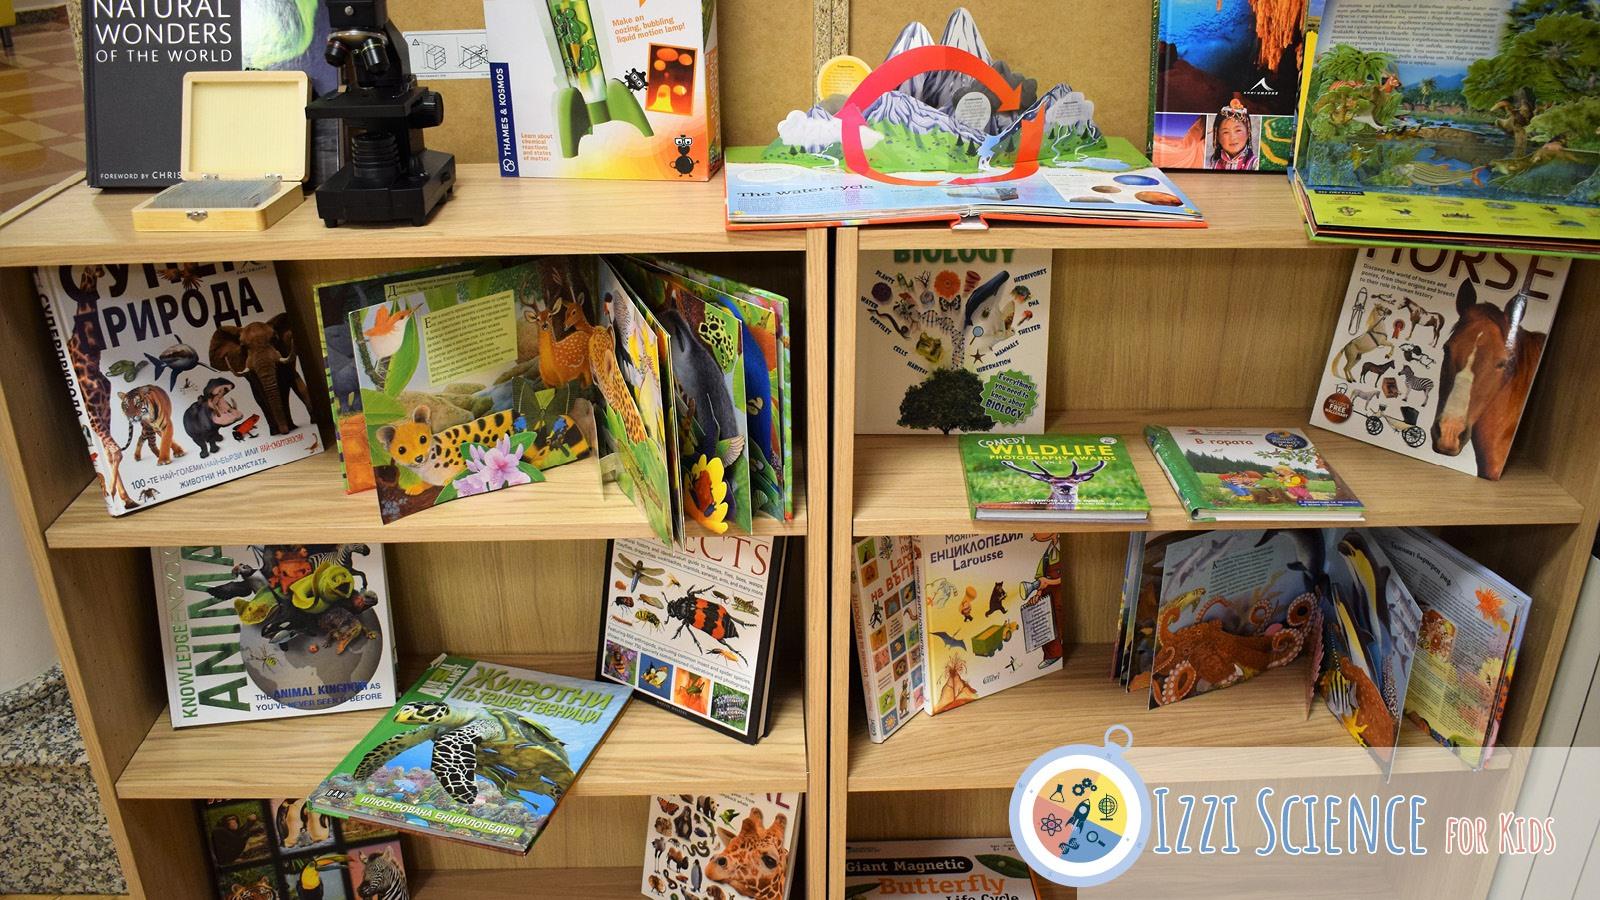 Частно начално училище Izzi Science for Kids библиотека